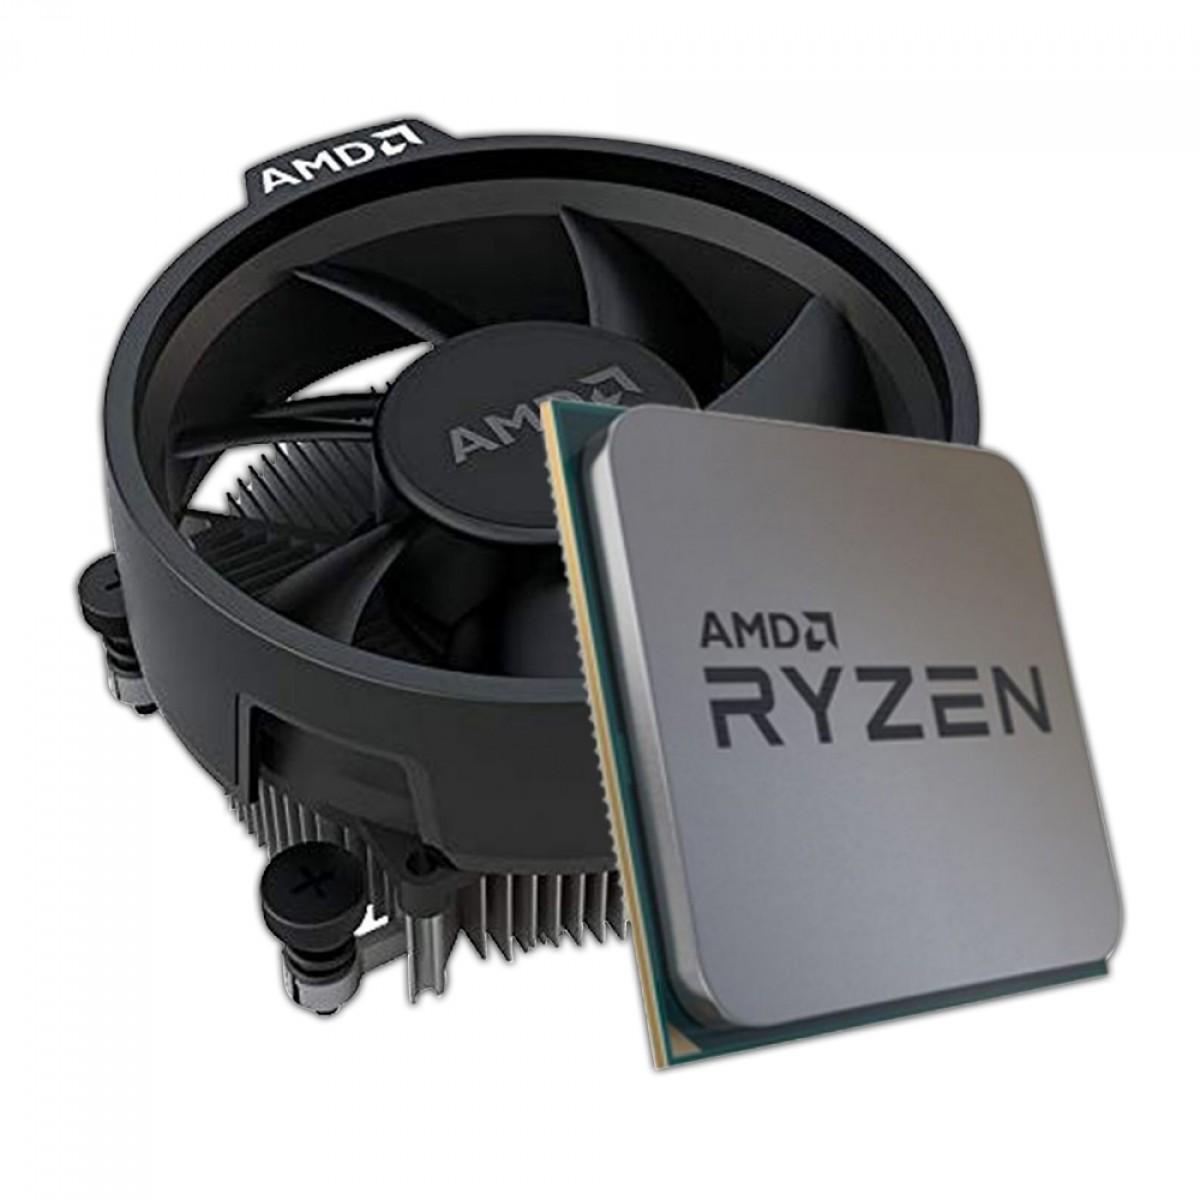 Kit Upgrade, AMD Ryzen 5 3400G, Gigabyte B450 AORUS M, Memória DDR4 8GB 3000MHz